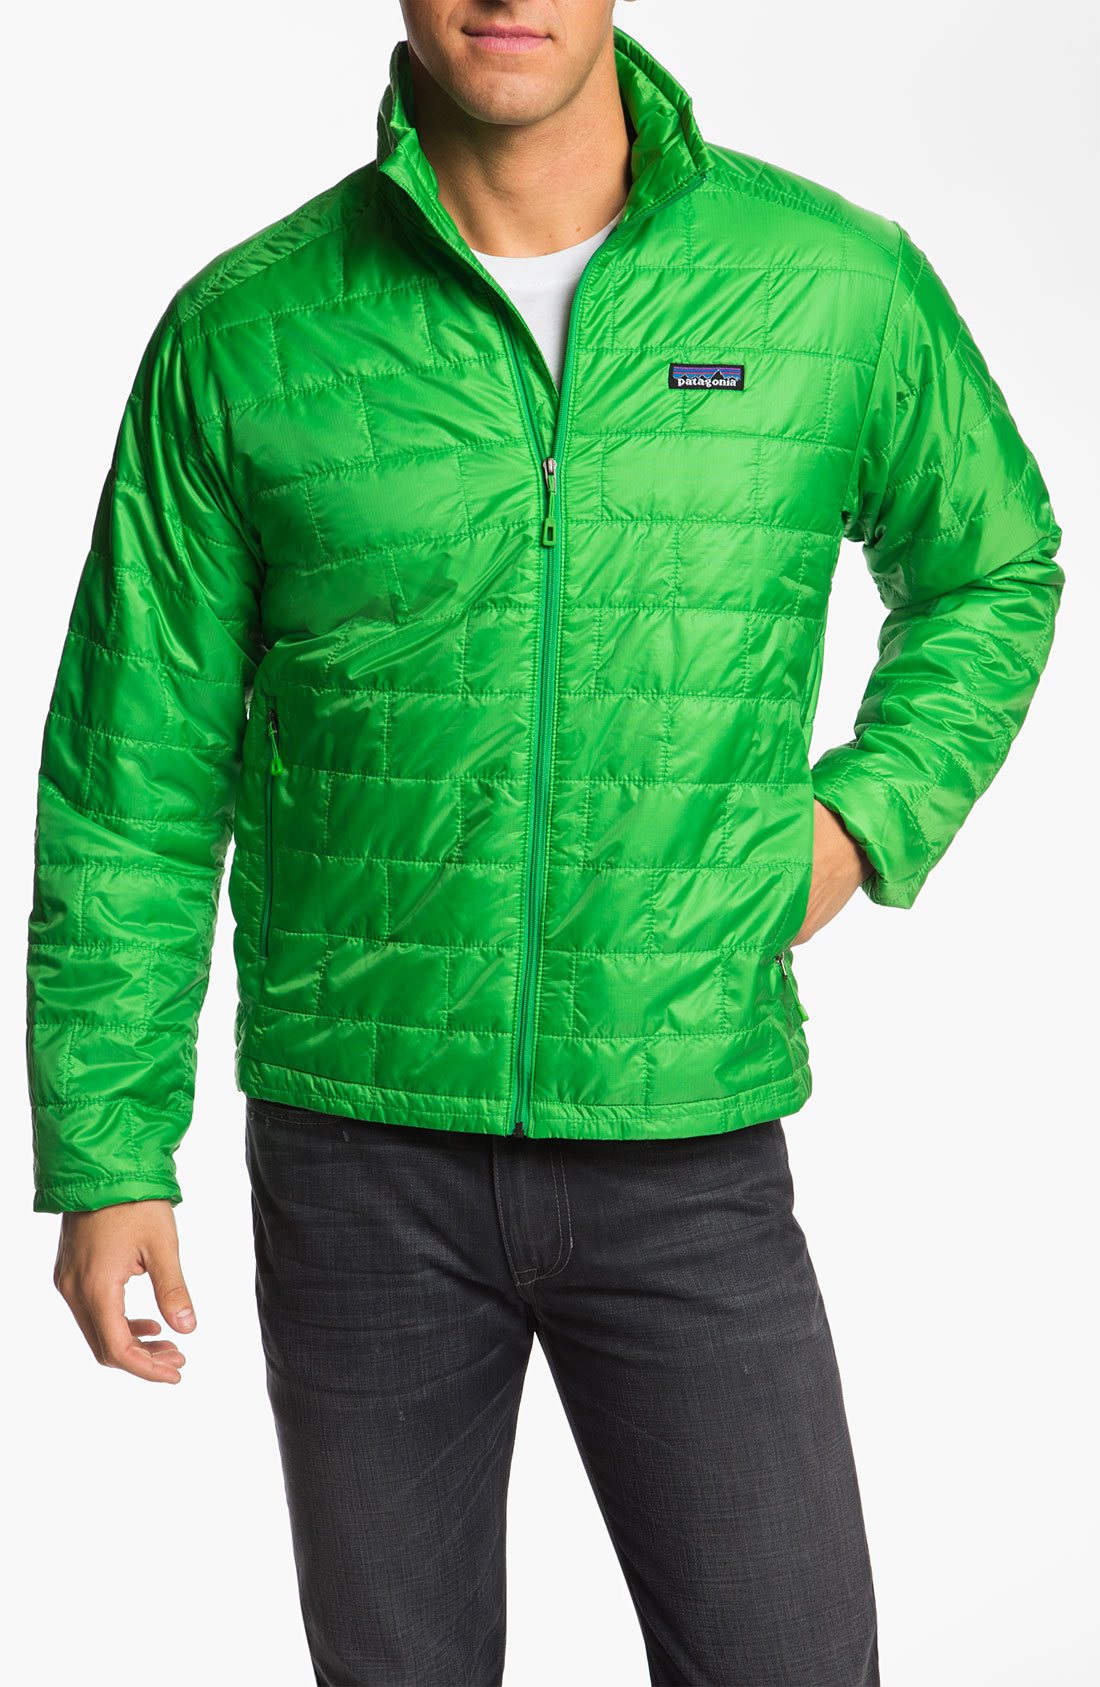 Patagonia Nano Puff Jacket In Green For Men Cilantro